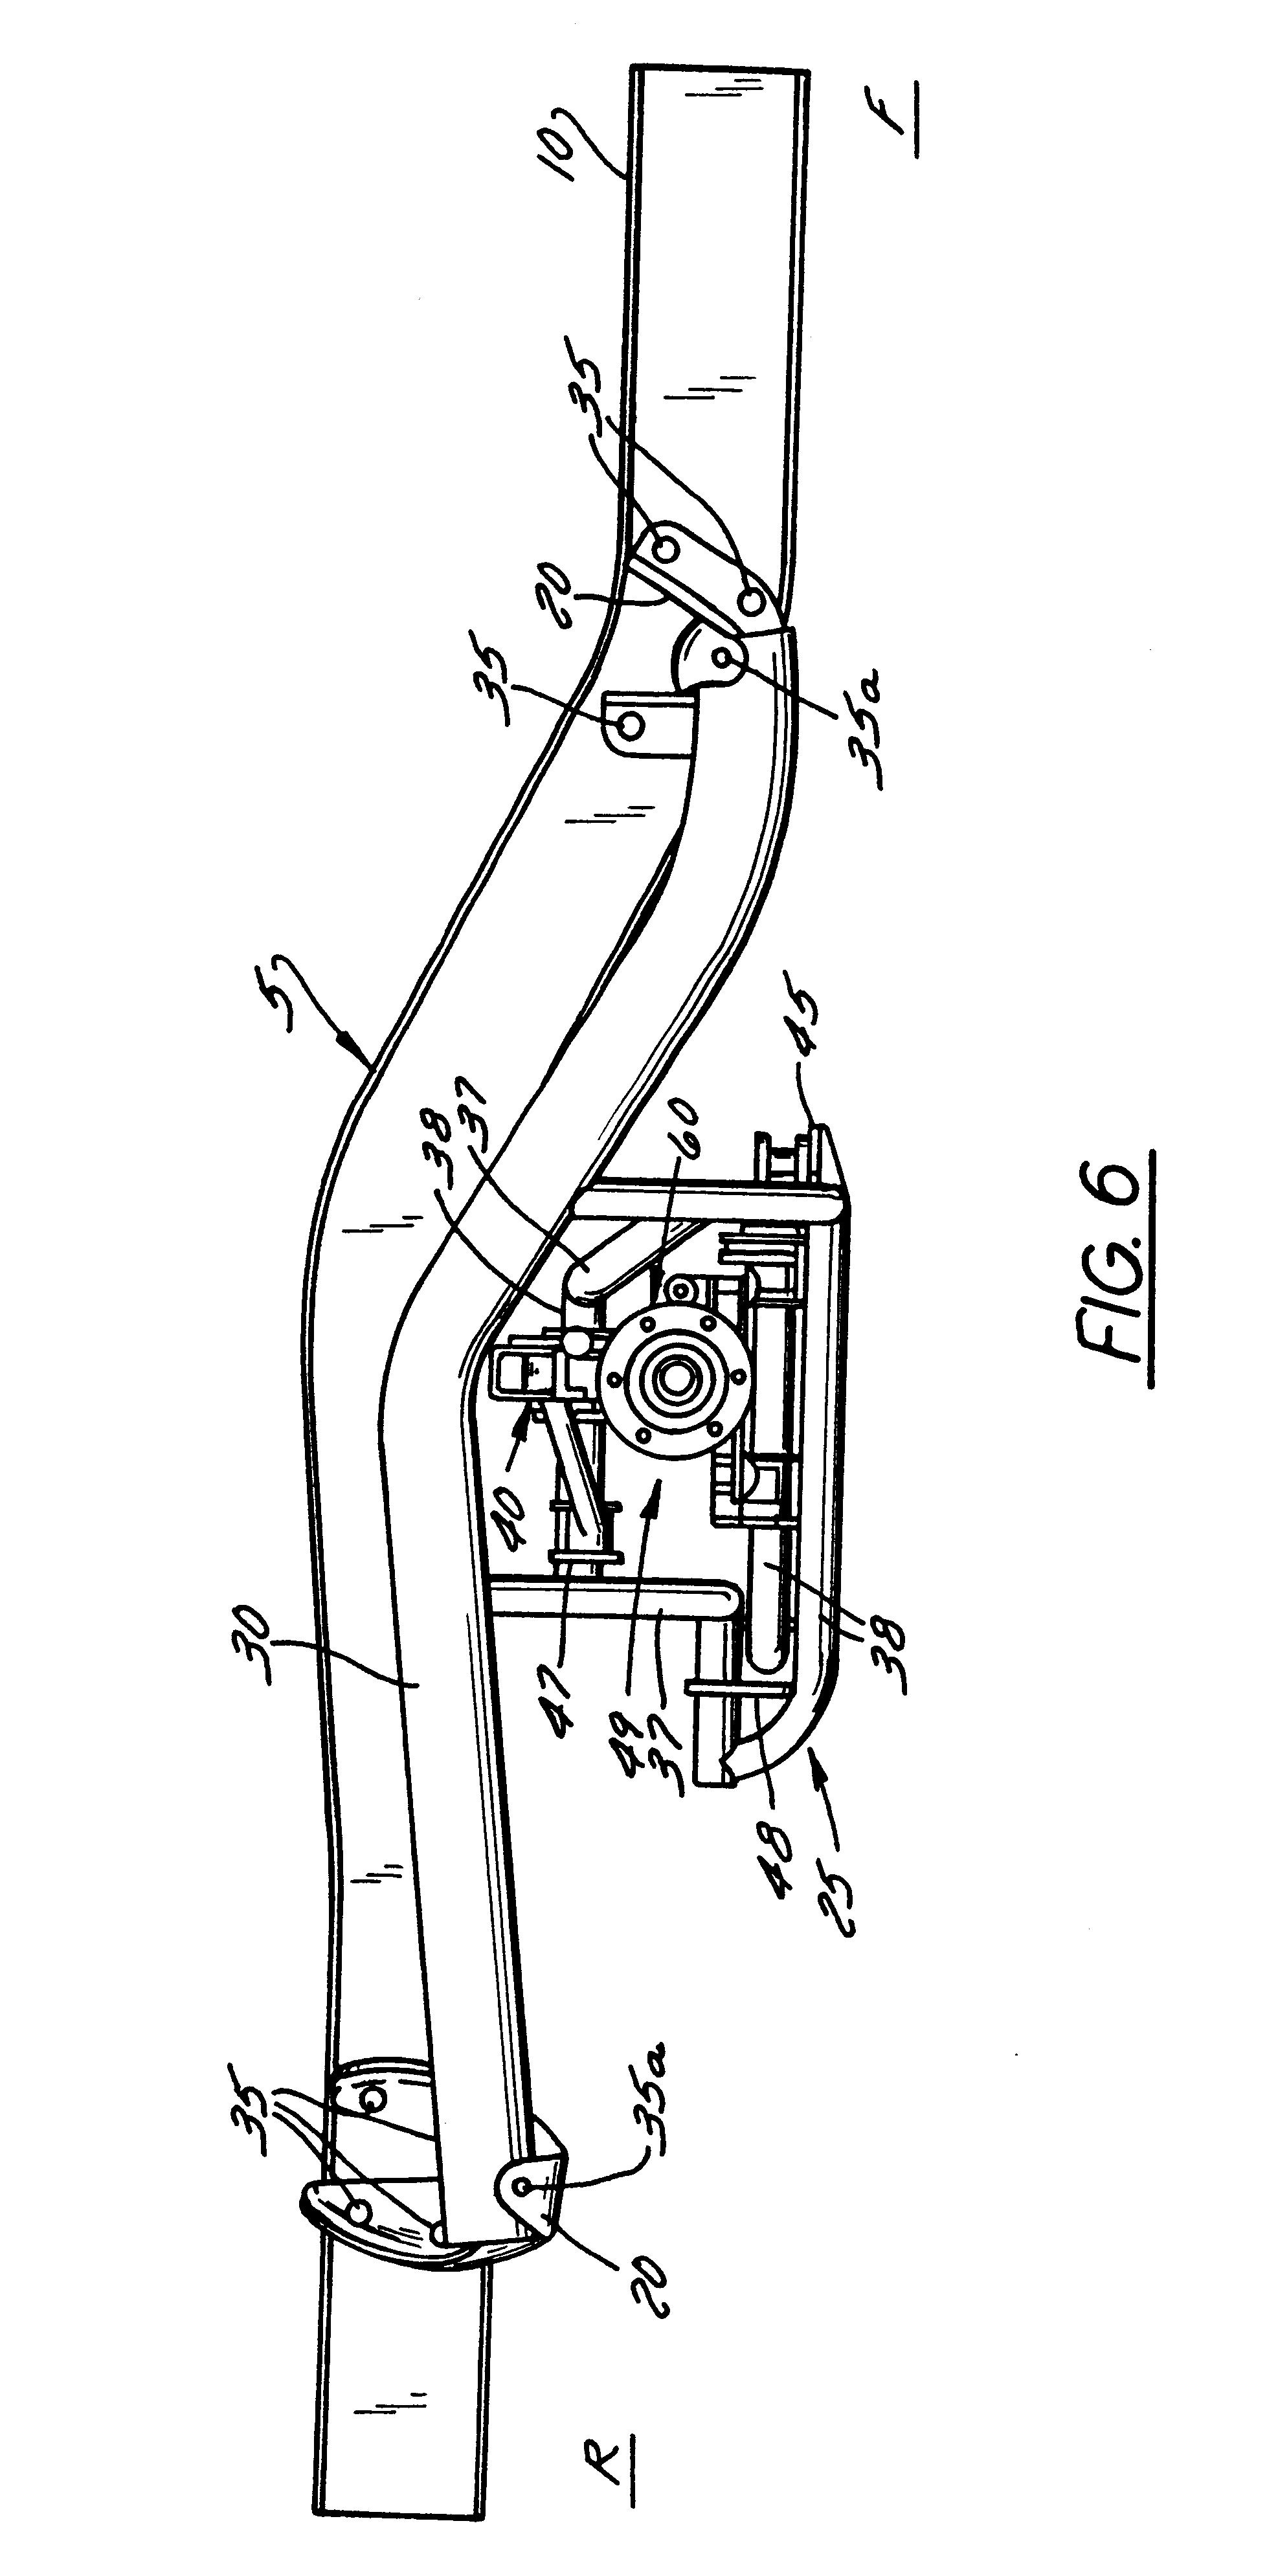 toyota rav4 engine parts diagram single phase motor wiring